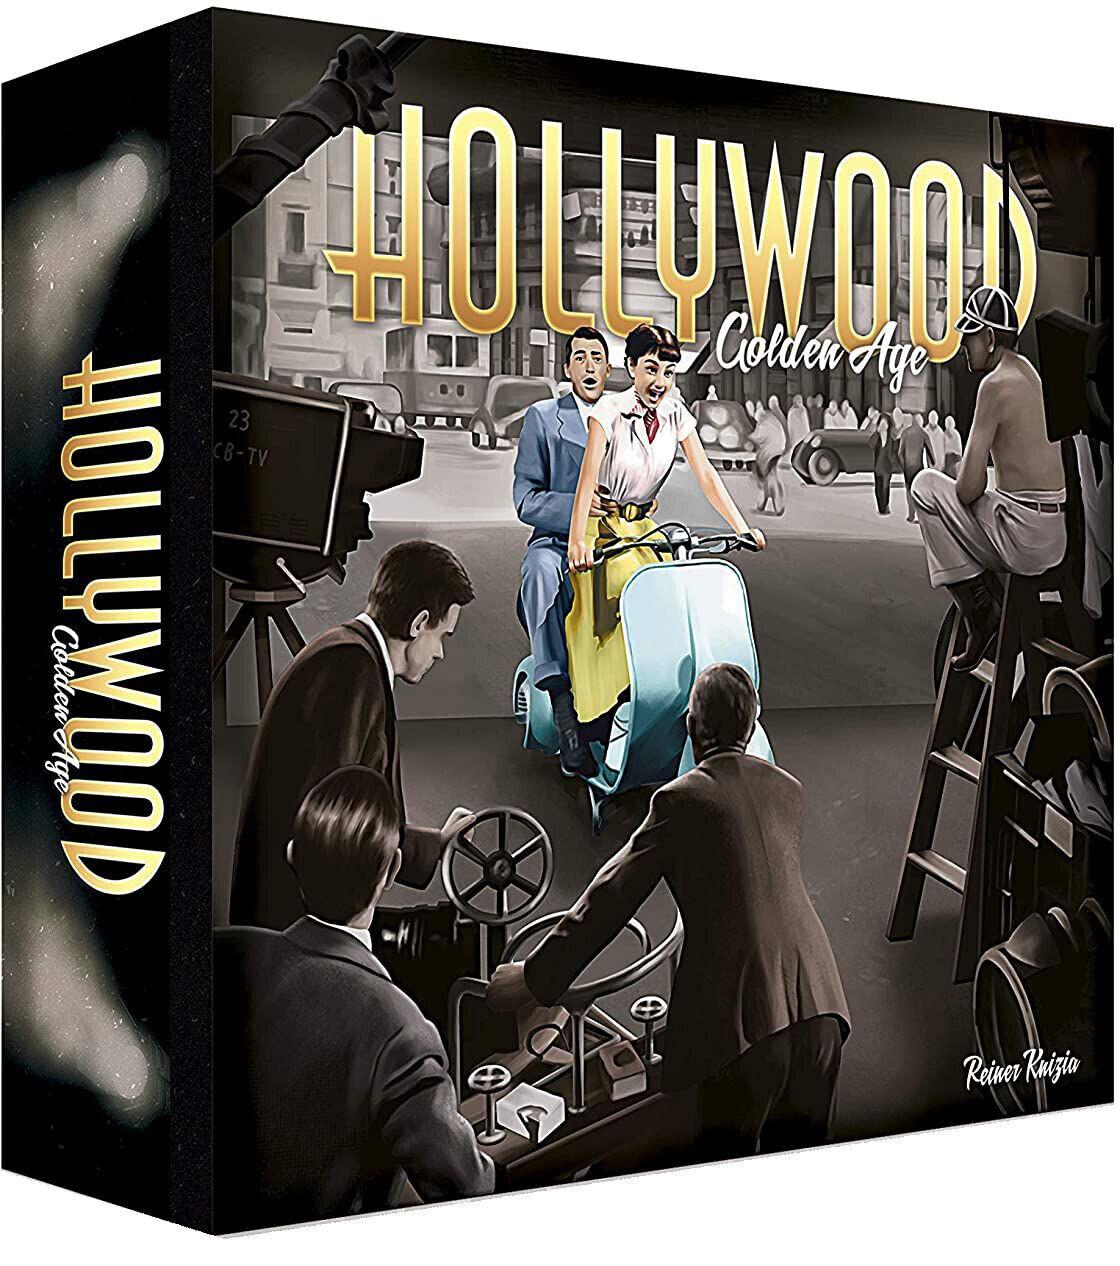 HOLLYWOOD GOLDEN AGE – JUEGO DE MESA - COOPERACIÓN, INVESTIGACIÓN, NUEVO ASMODEE